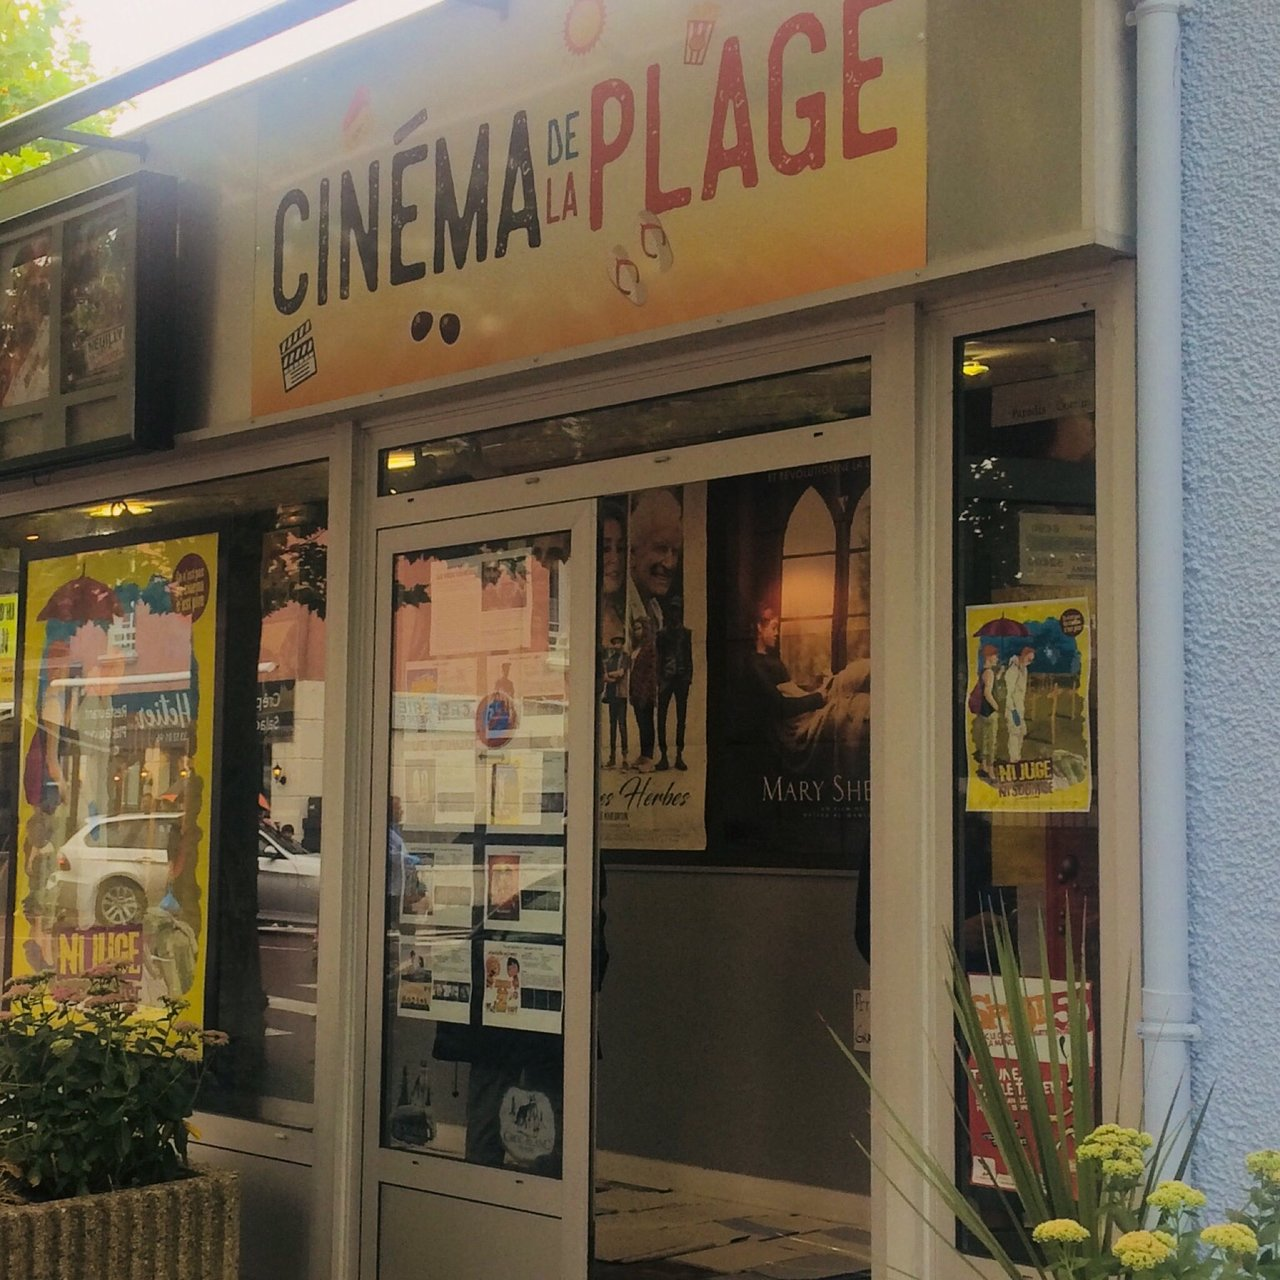 Cinema de la Plage (Barneville-Carteret) - 10 All You Need to